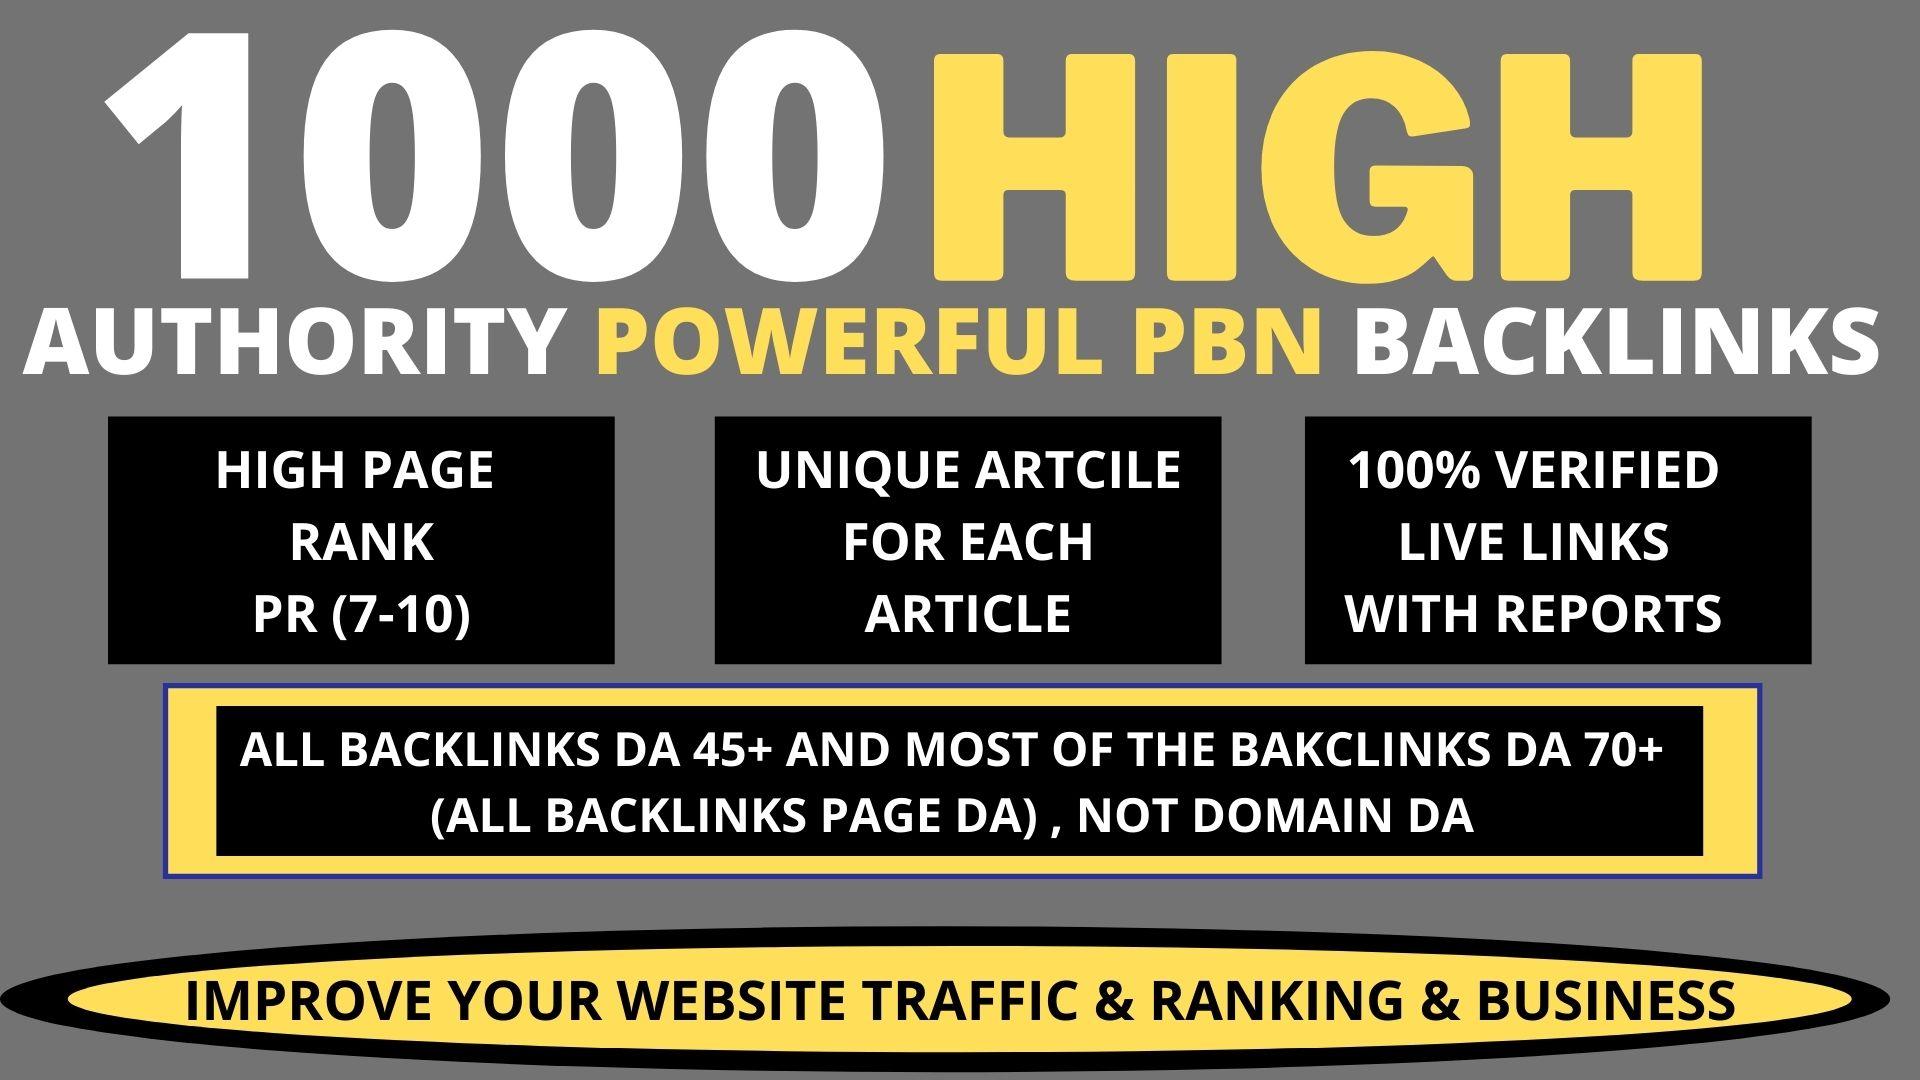 1000 Online Casino Poker judi Gambling Web 2.0 PBN Dofollow Backlinks with DA 70-95 HQ Seo Service